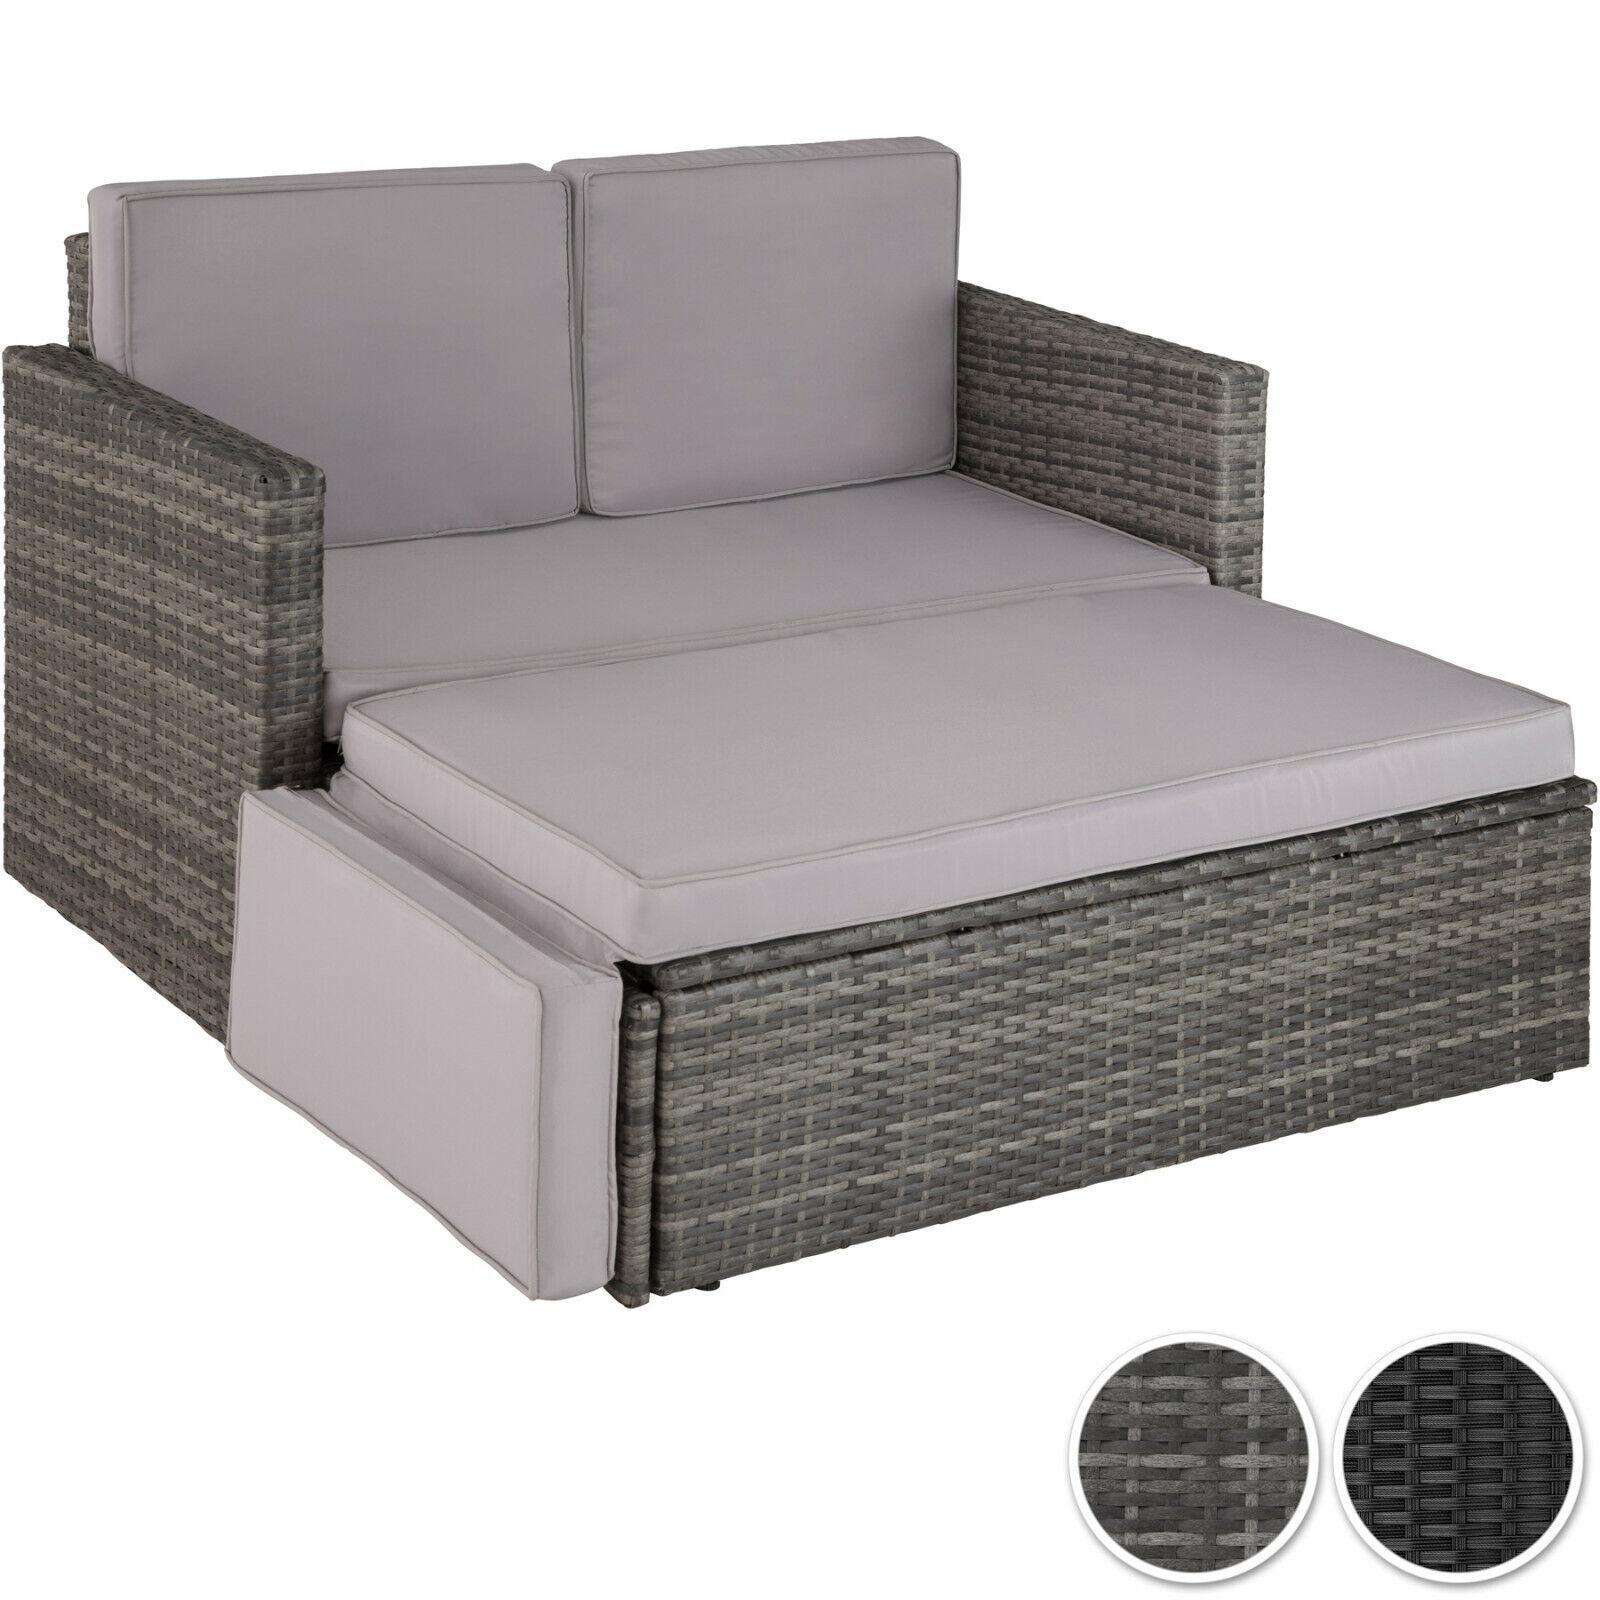 Garden Furniture - Rattan Lounge Sofa Double Chair Furniture Stool Set Cushion Garden Seating Patio